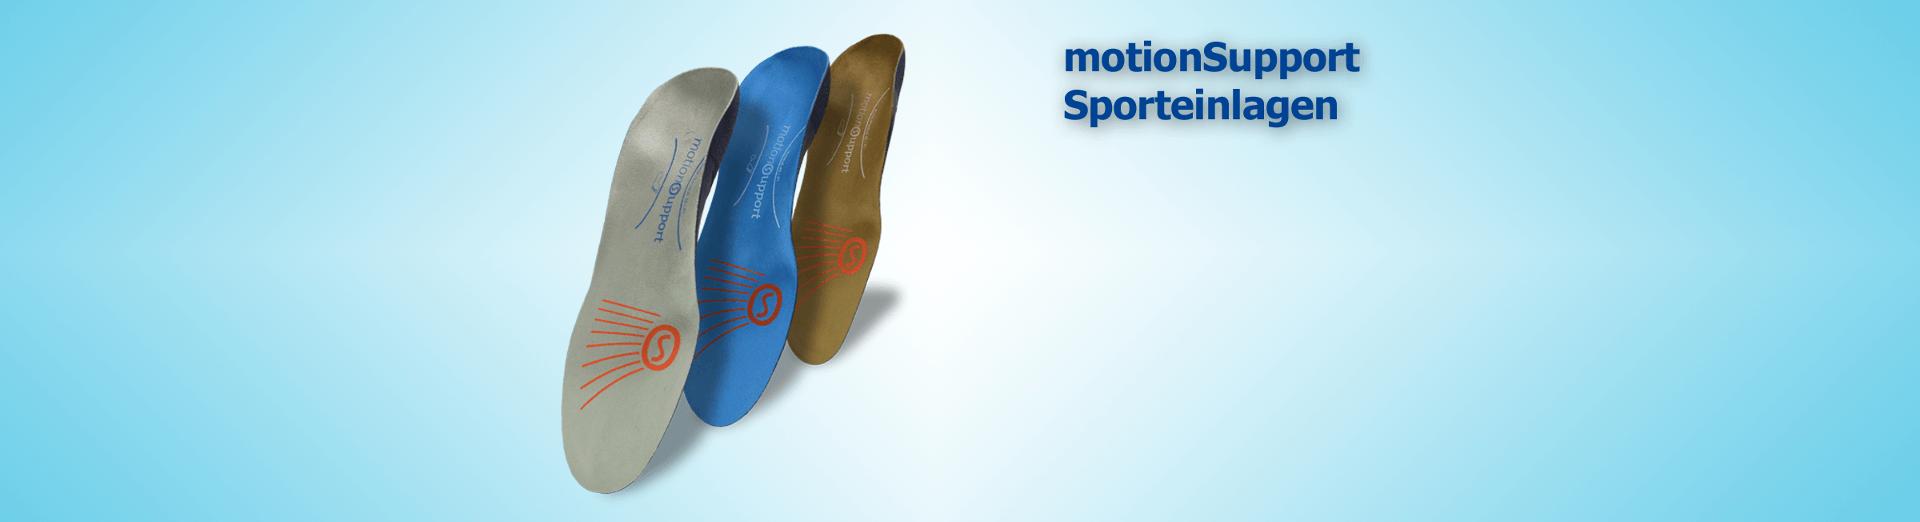 MotionSupport